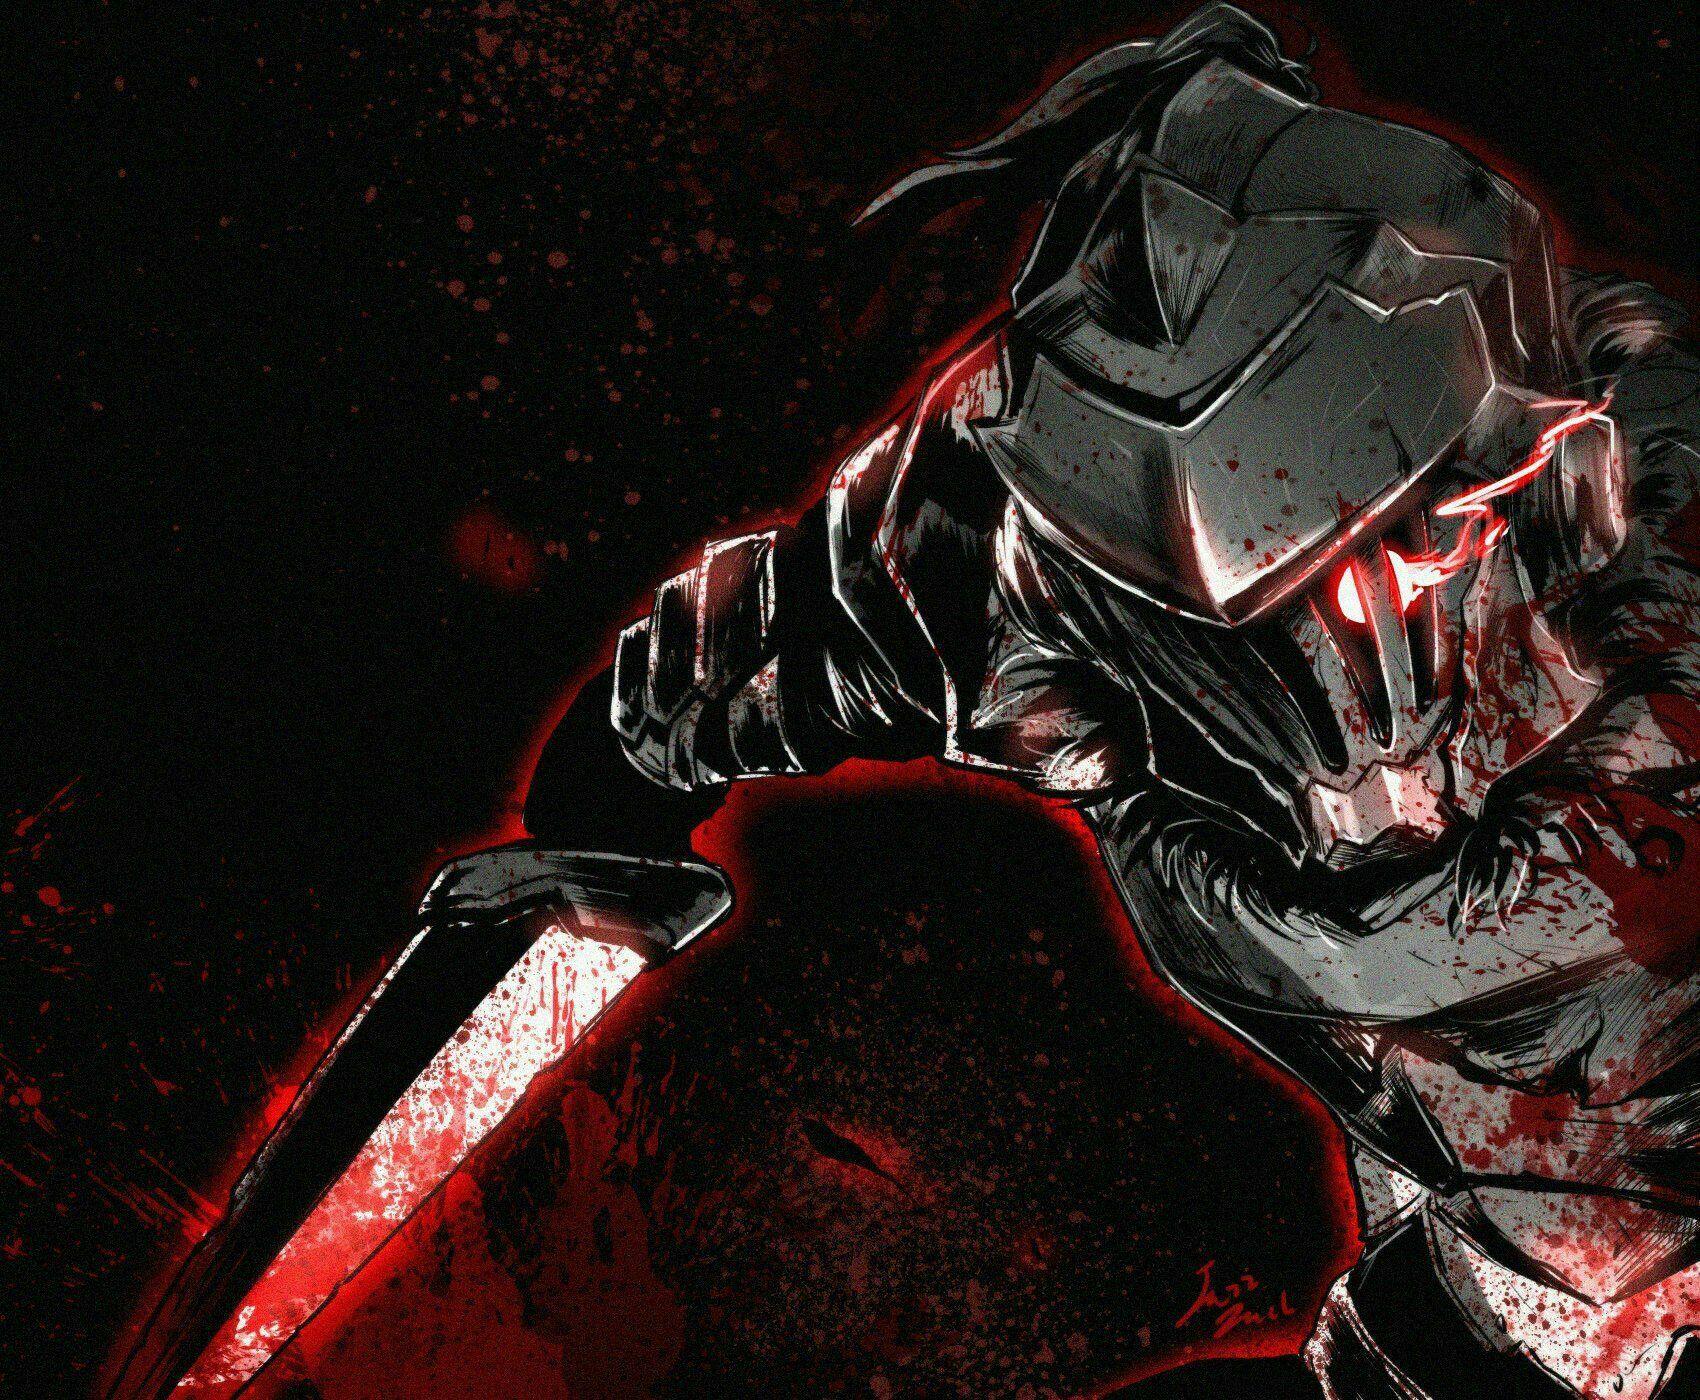 Goblin Slayer ゴブリンスレイヤー